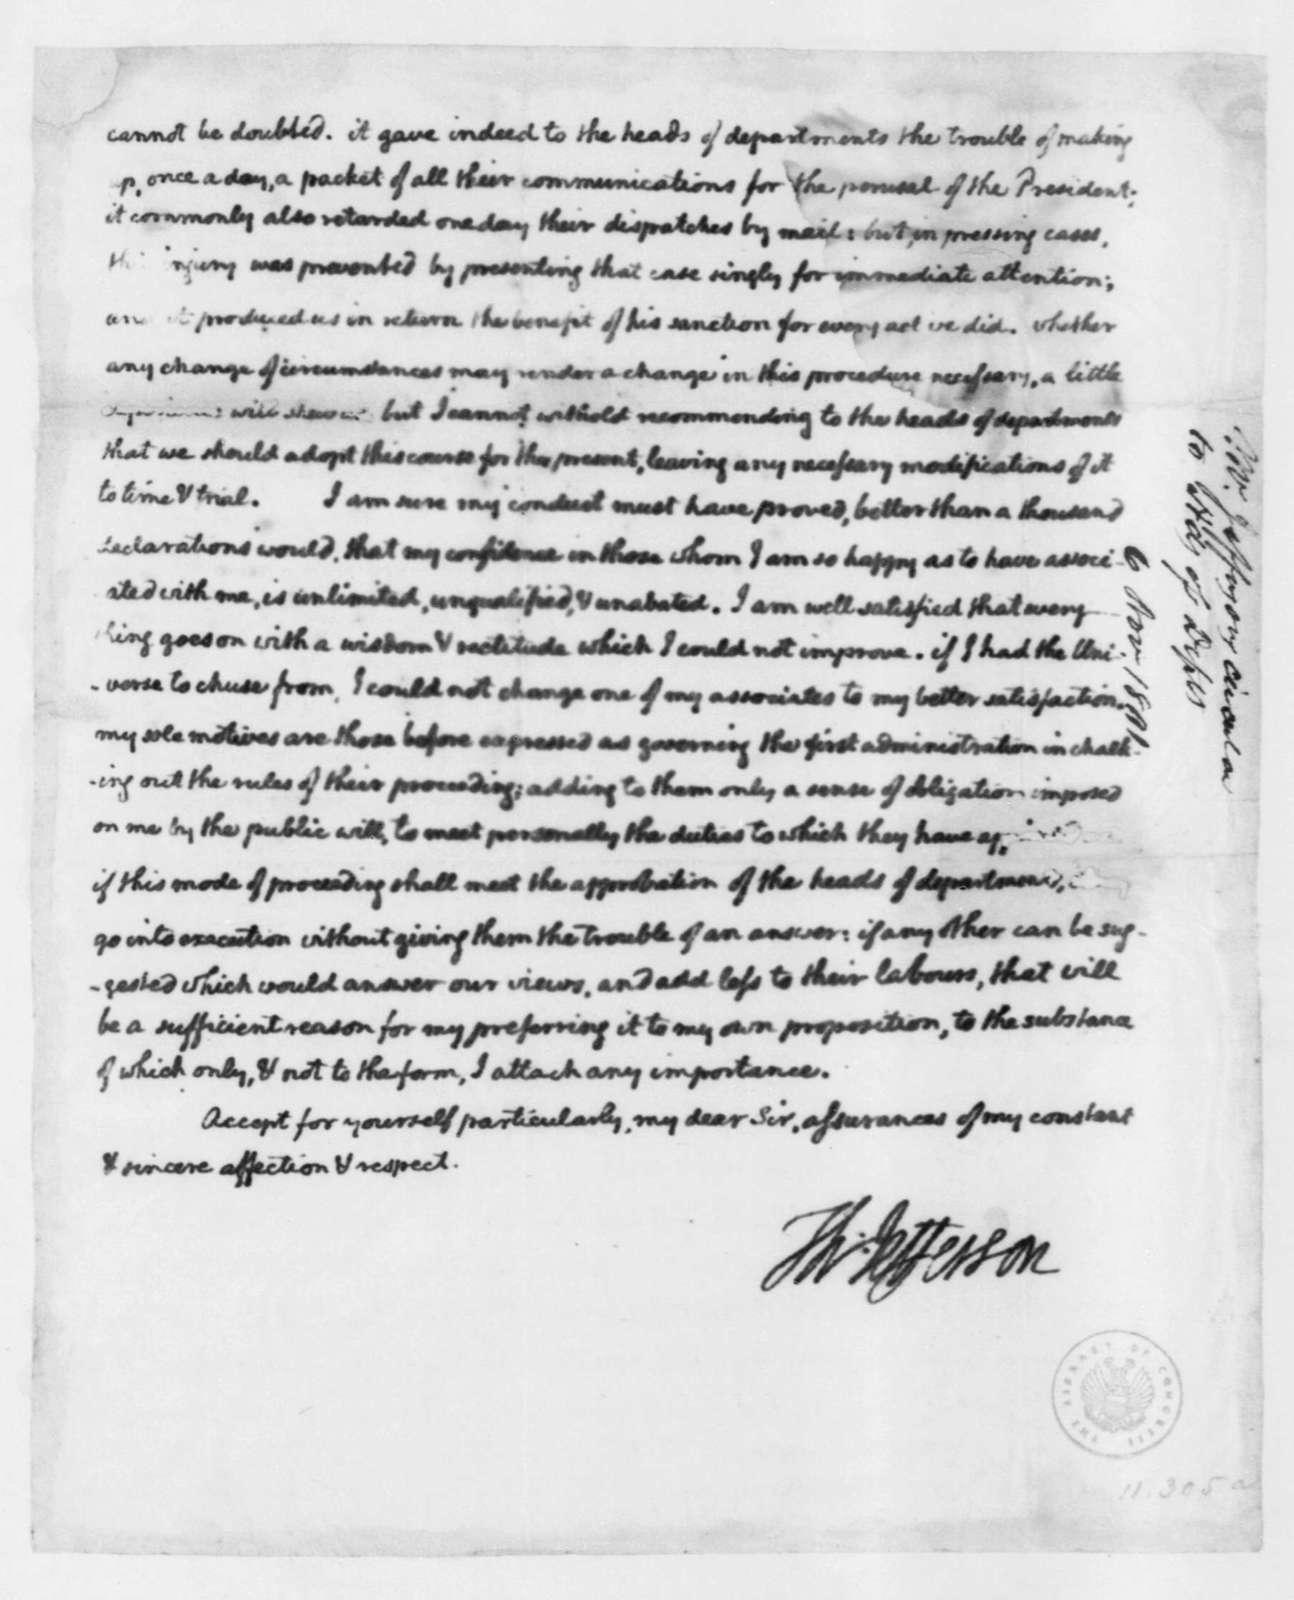 Thomas Jefferson to Cabinet Members, November 6, 1801 ...